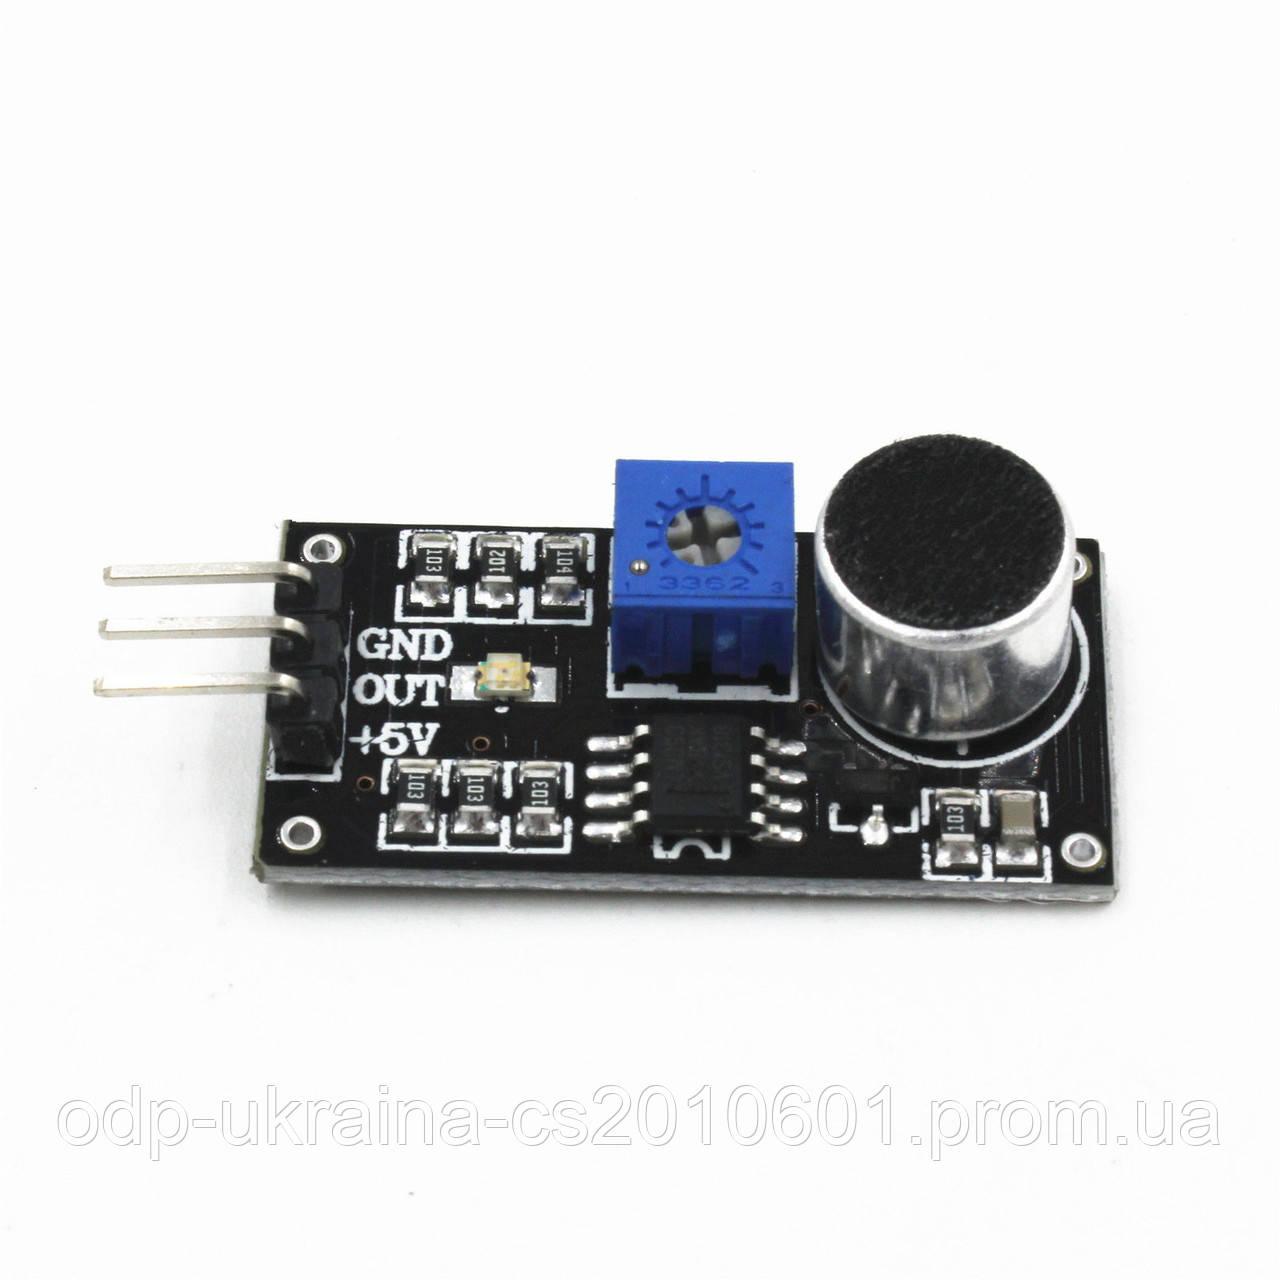 Датчик звука или Акустический сенсор модуль для Arduino AVR PIC